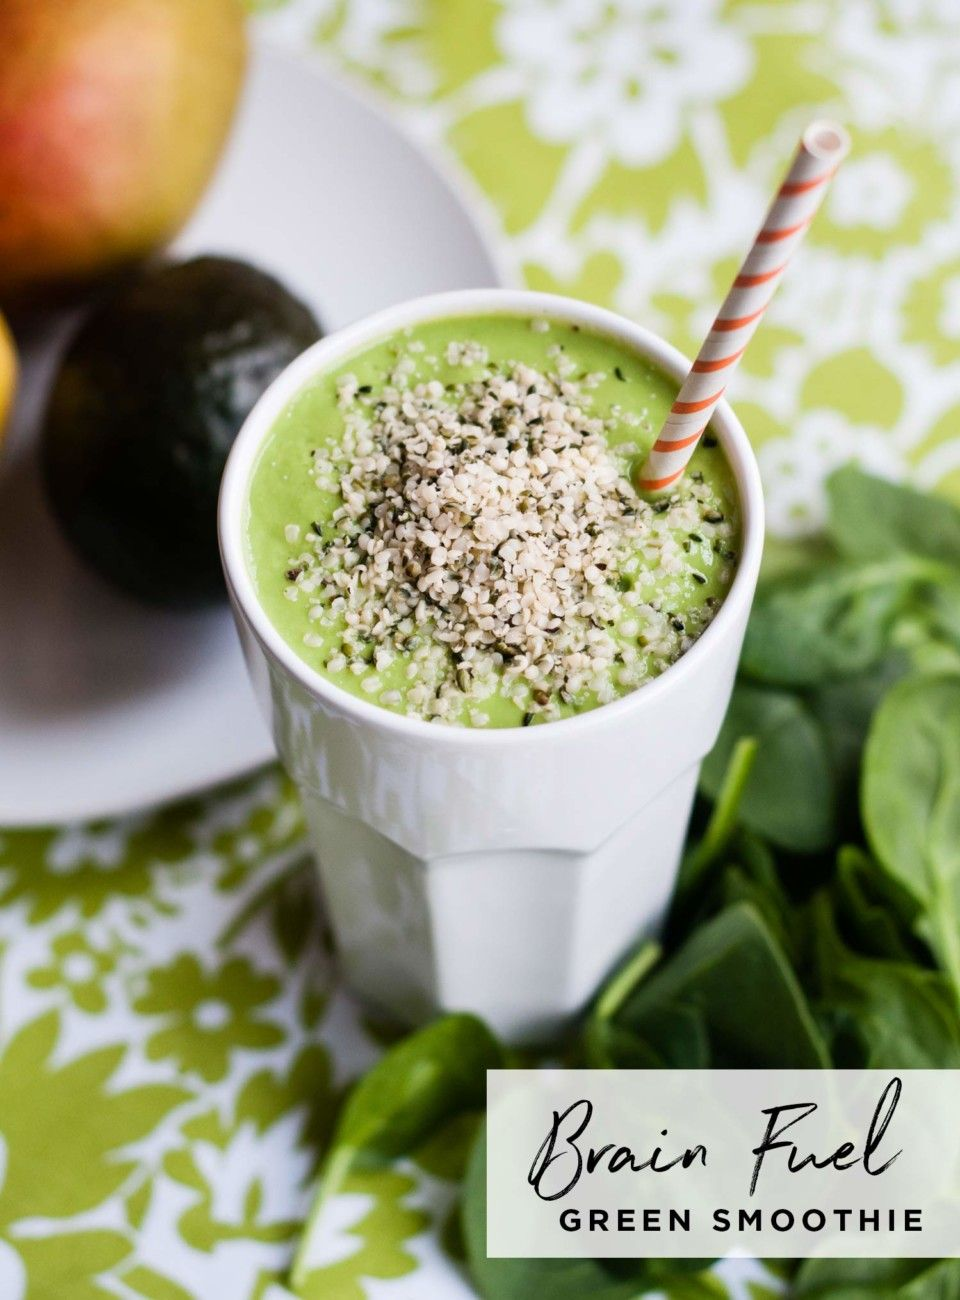 Brain Fuel Green Smoothie Recipe Avocado Smoothie Smoothies Healthy Green Smoothies